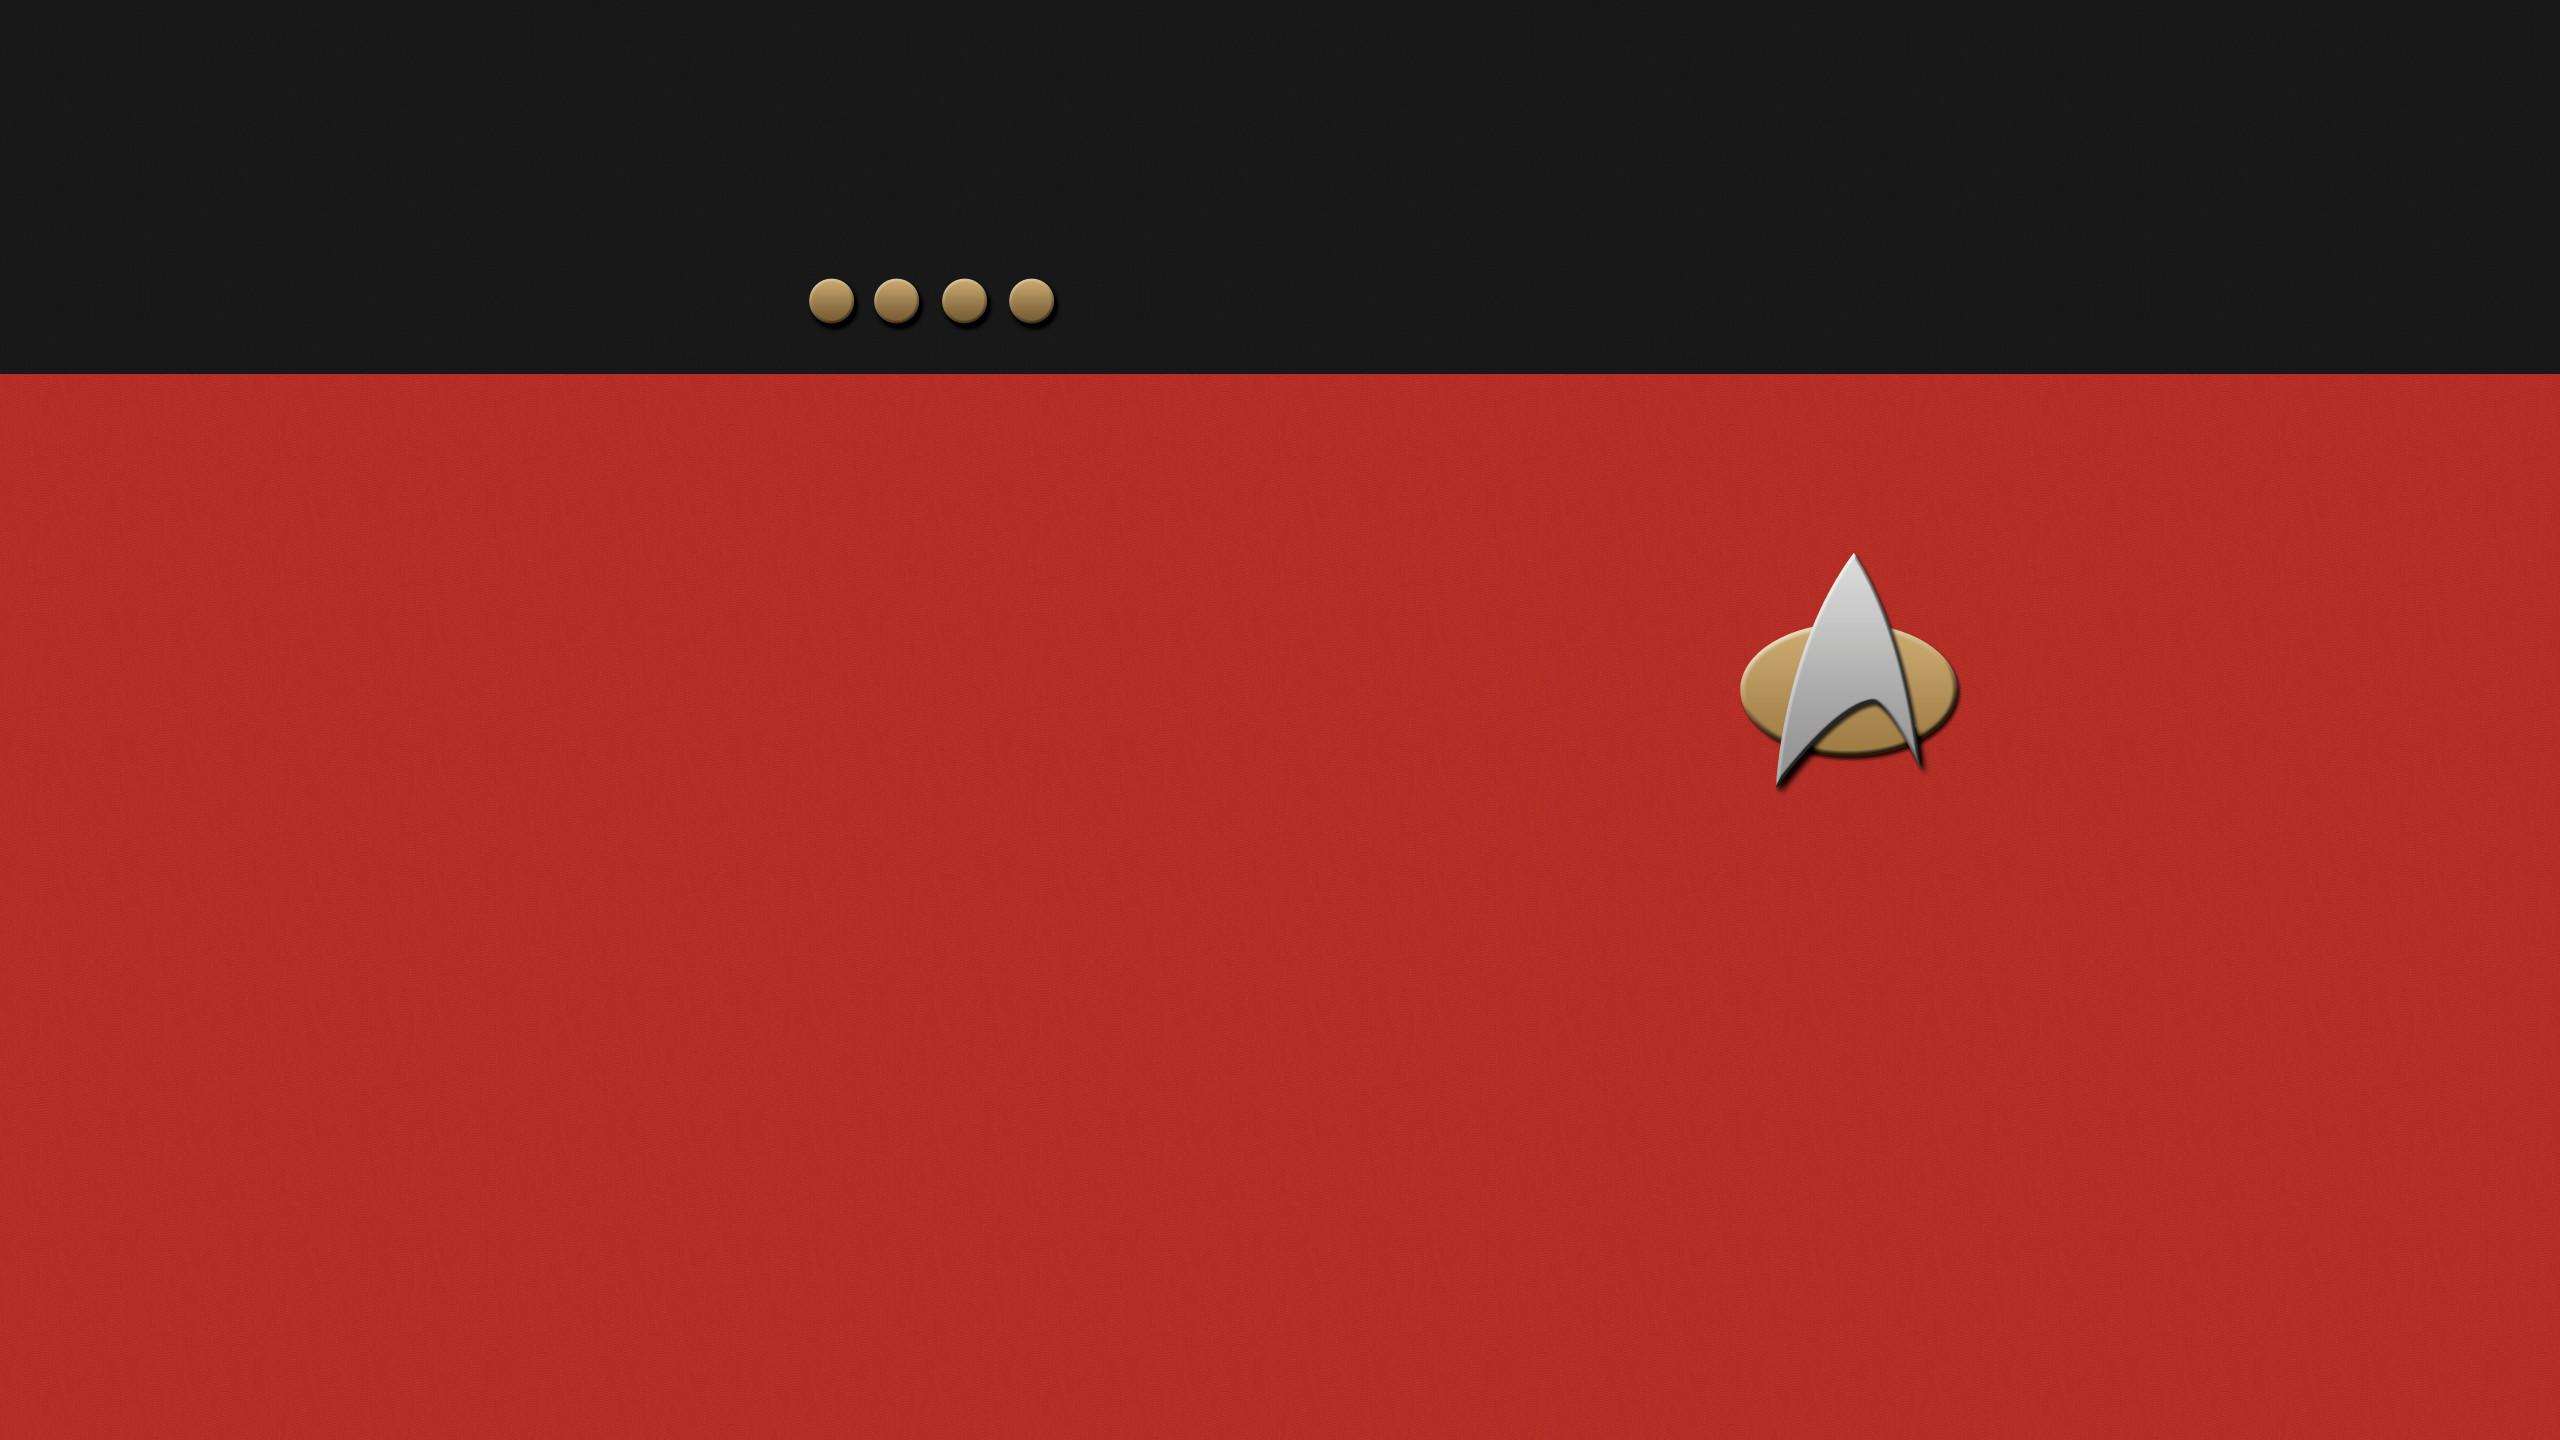 Star Trek Tng Wallpapers – Wallpaper Cave